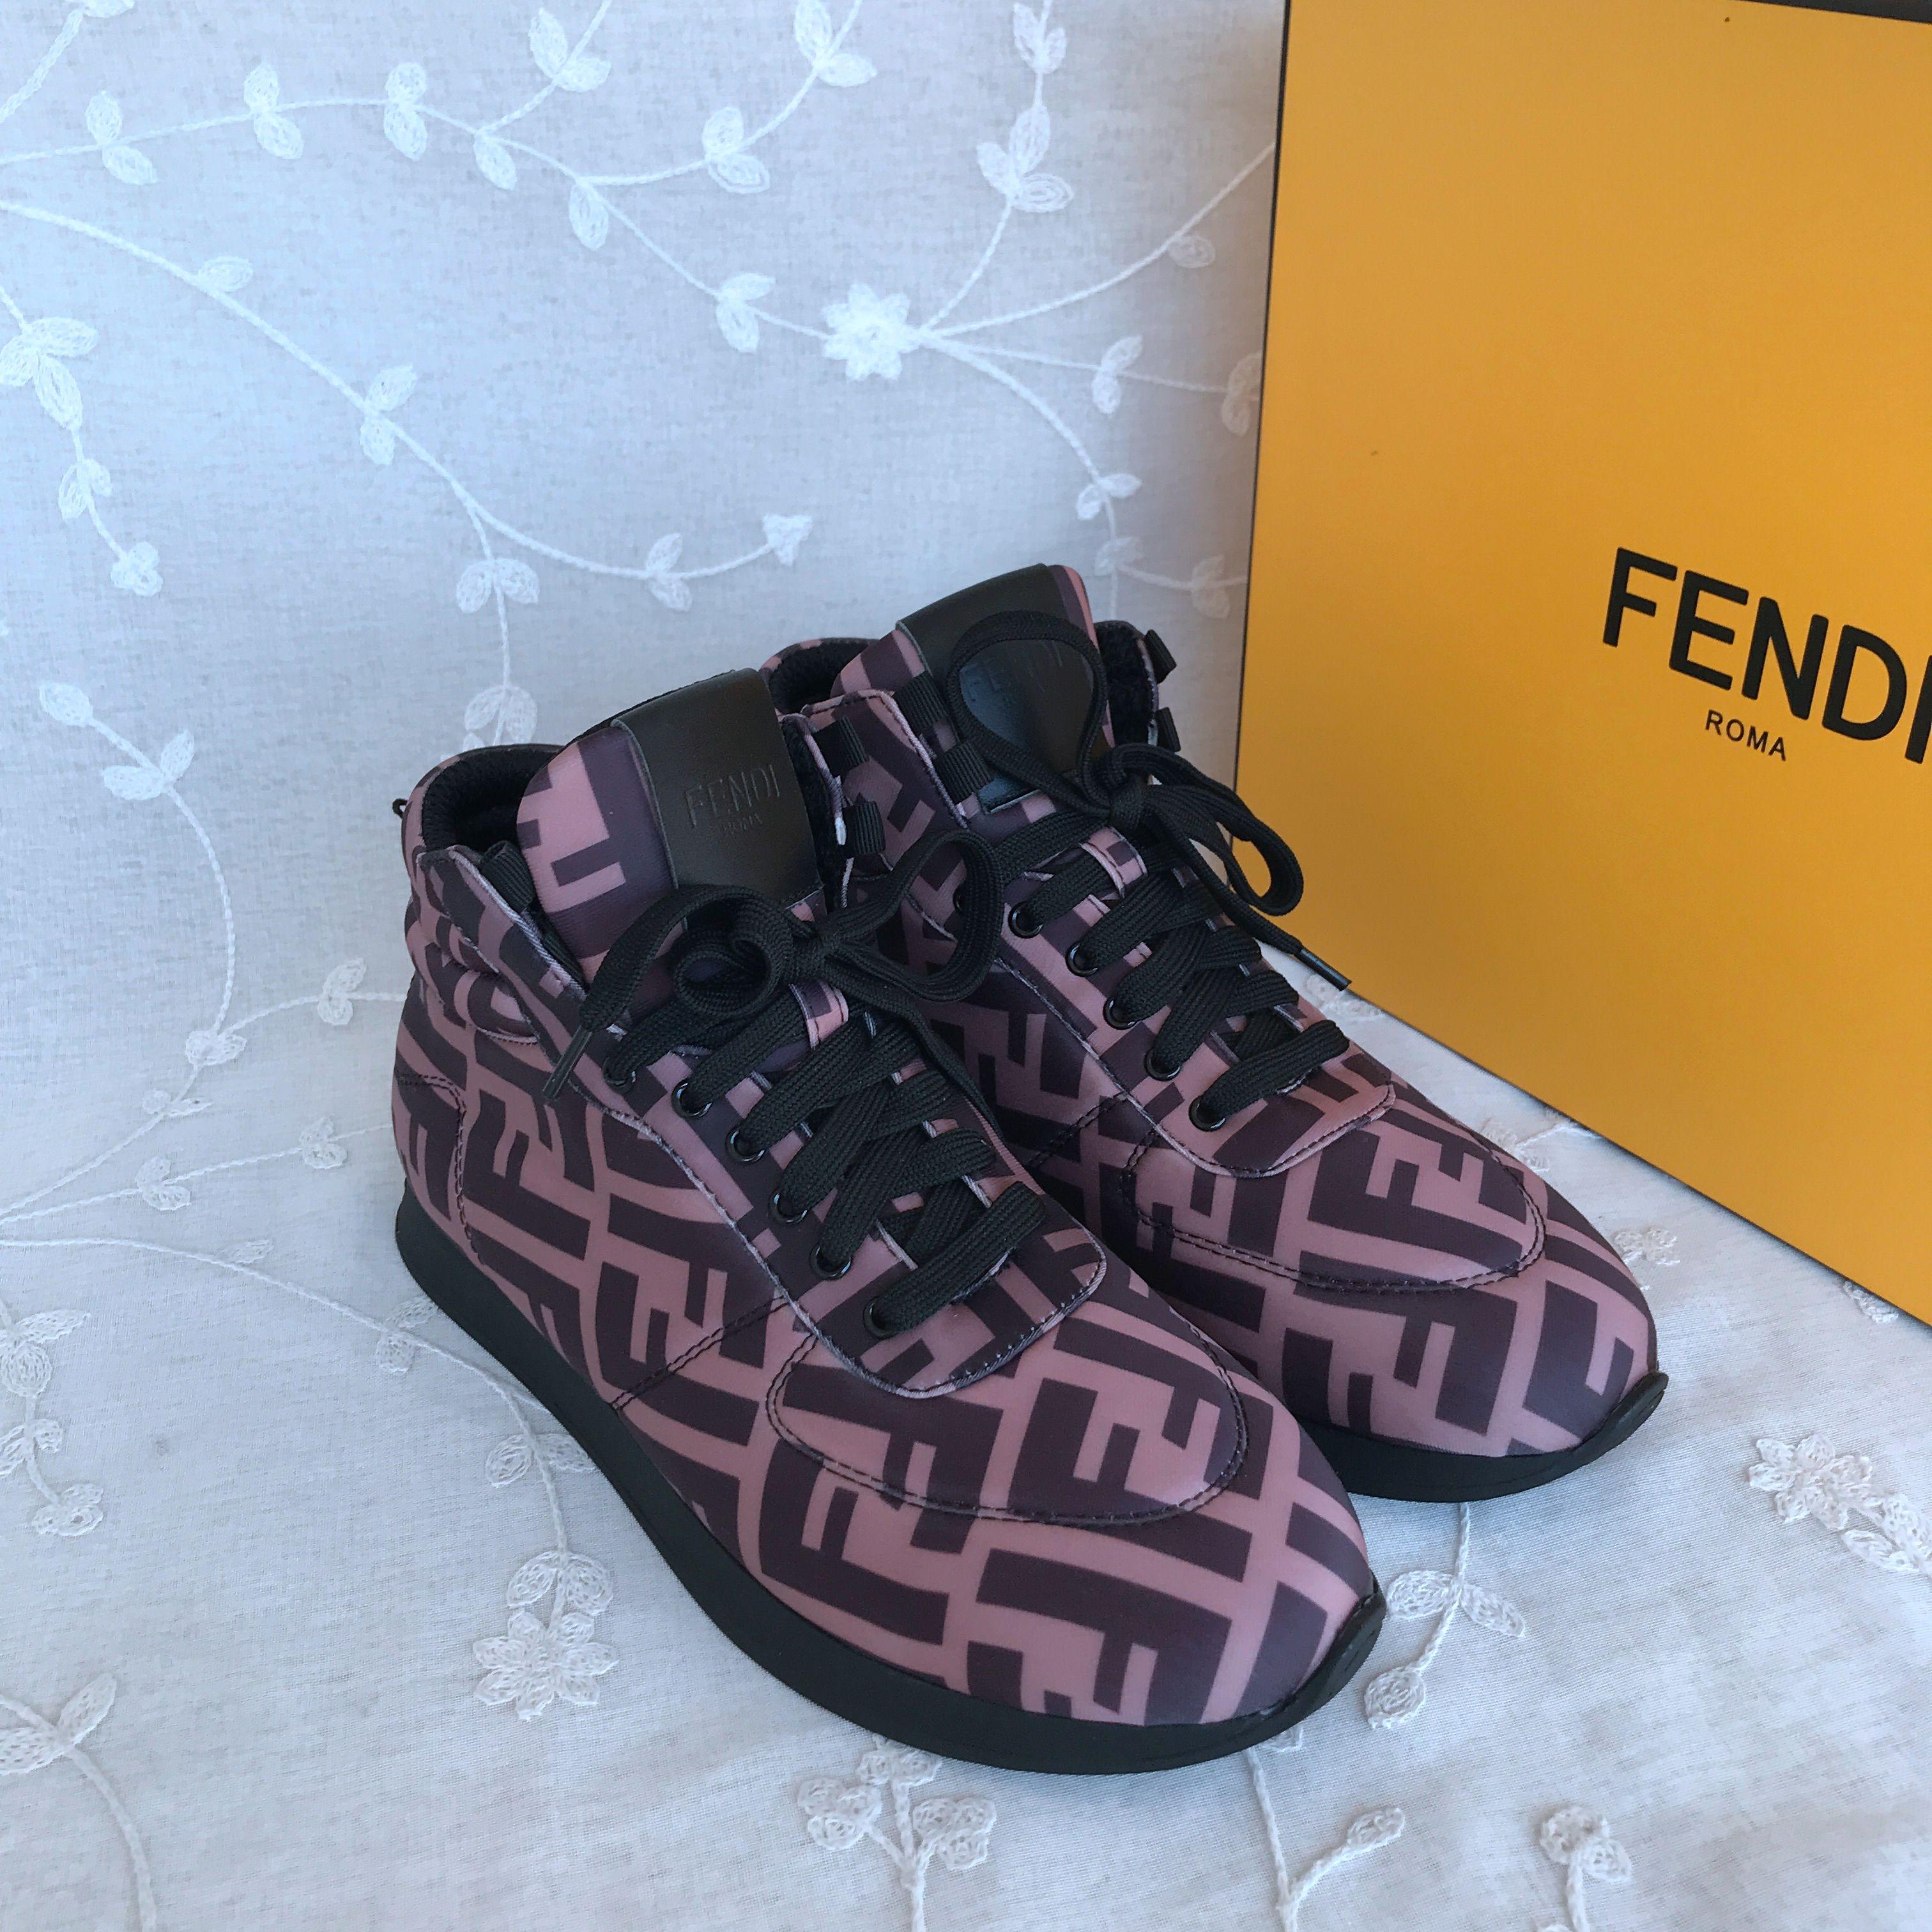 Fendi Casual Shoes